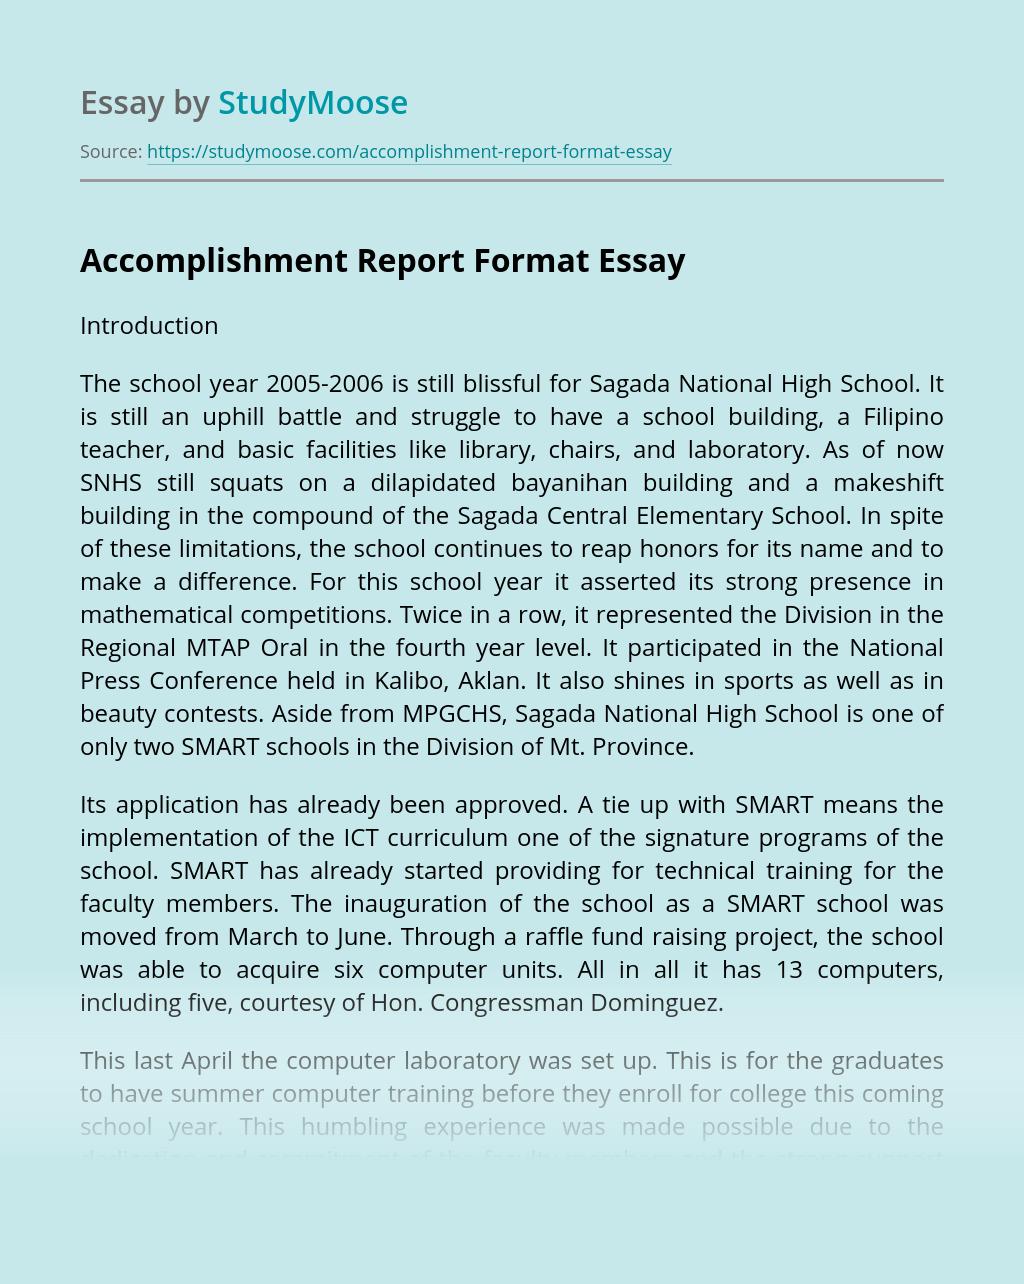 Accomplishment Report Format